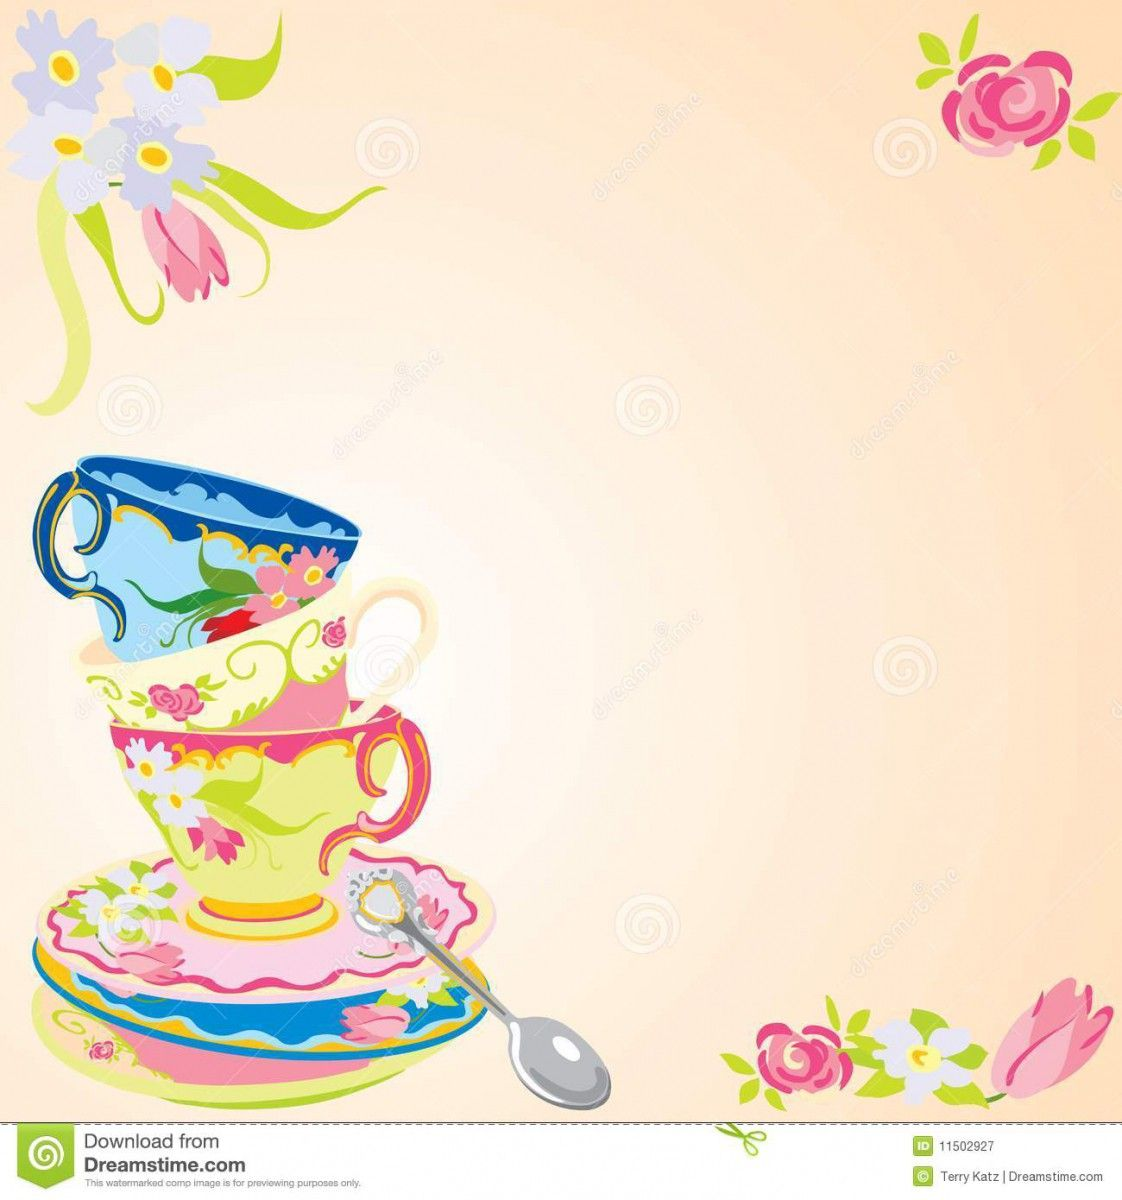 Free printable high tea party invitations tea party pinterest free printable high tea party invitations monicamarmolfo Image collections